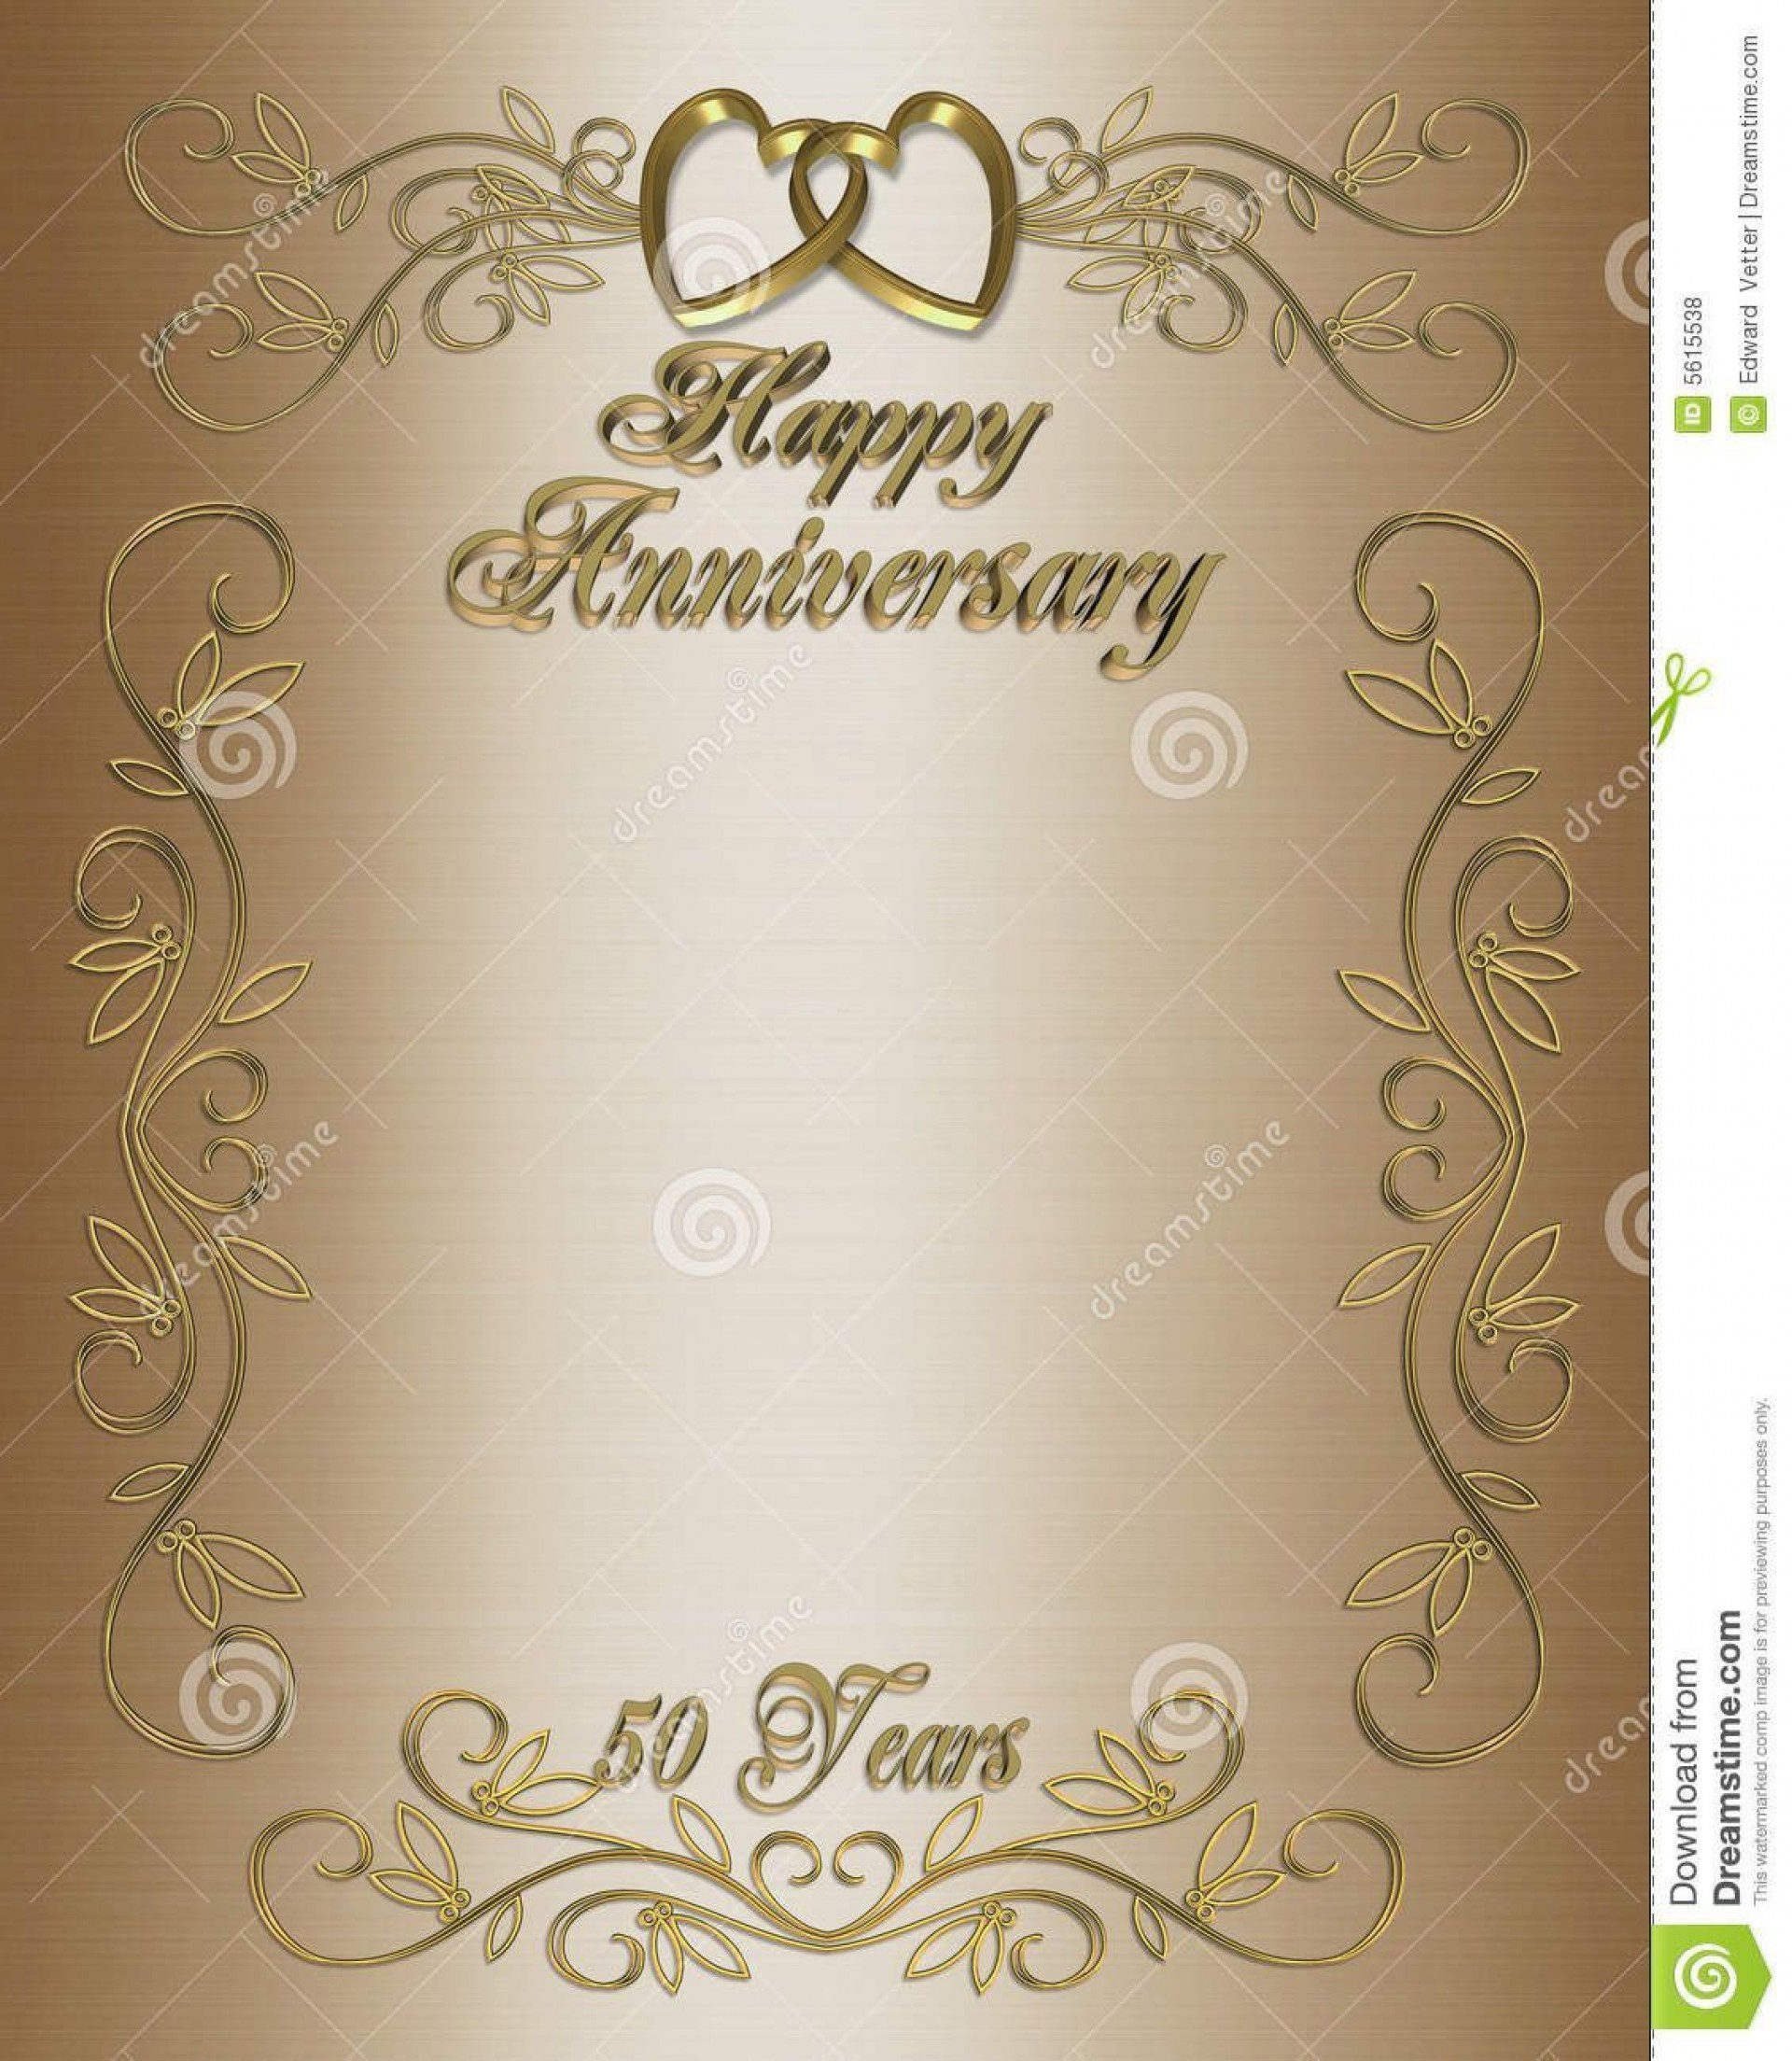 007 Stupendou 50th Anniversary Invitation Template Free High Resolution  Download Golden Wedding1920